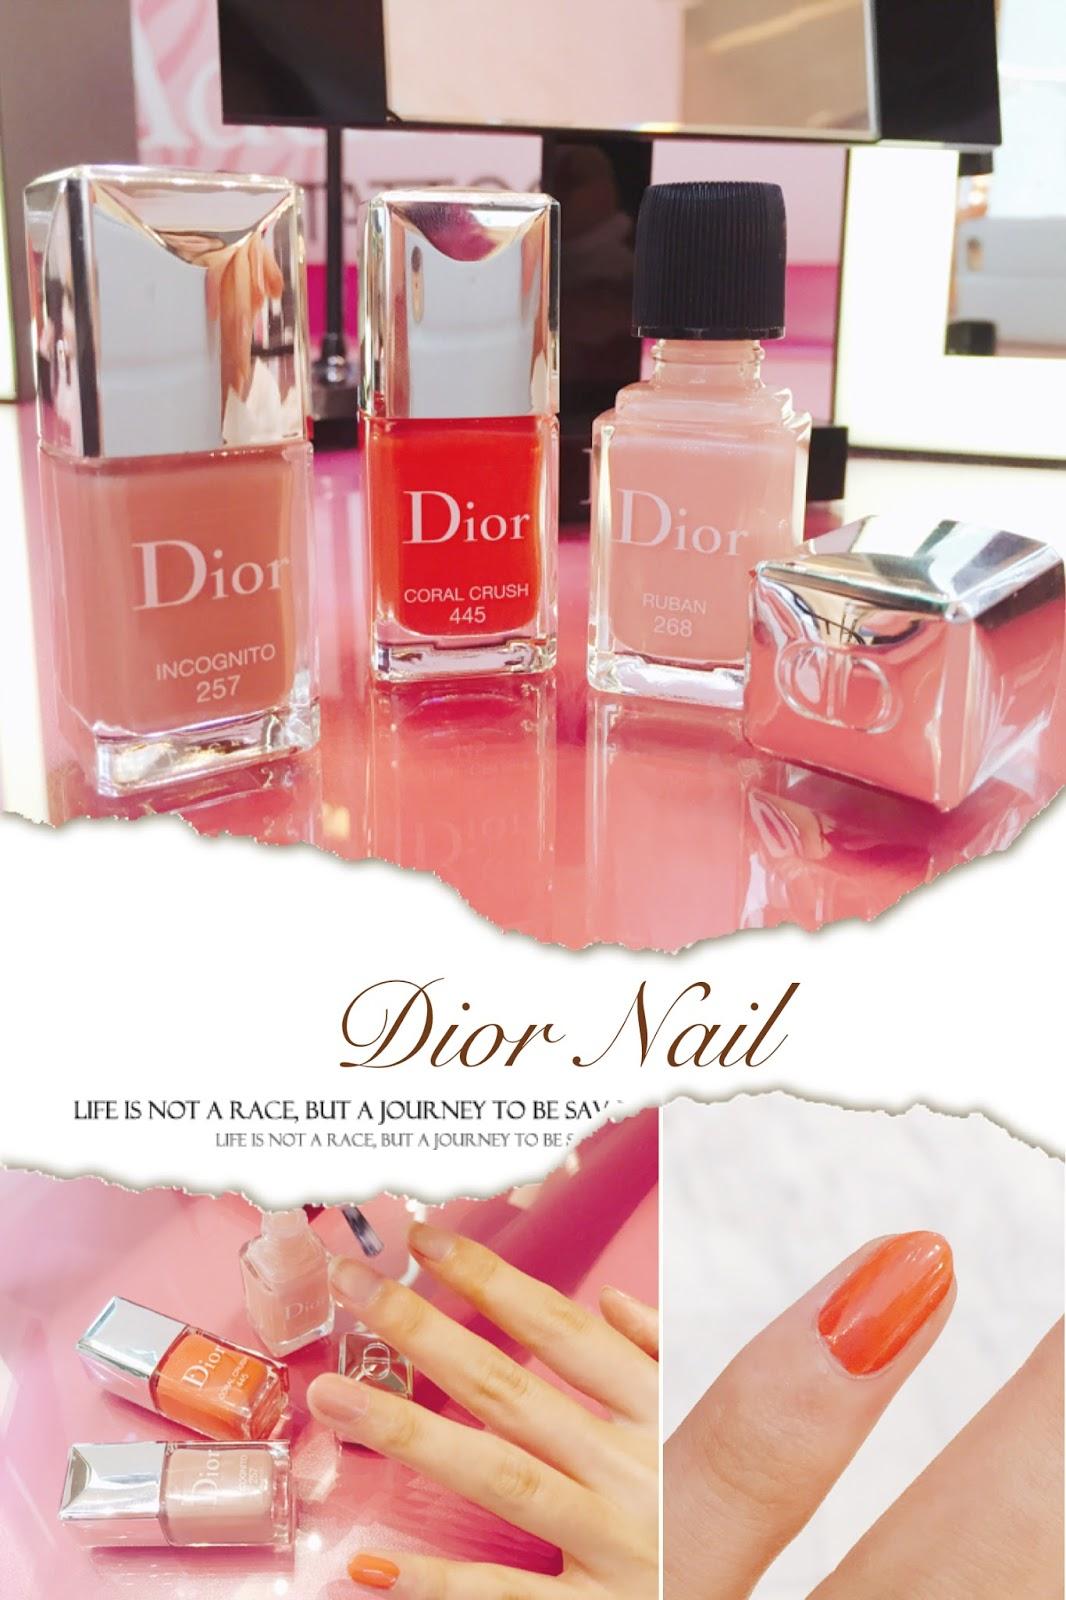 https://1.bp.blogspot.com/-uACNp7Fs1u8/WTUQ5-8-EJI/AAAAAAAAUAc/O0I4nVoGgT0sk3z5koN6MoVOY8KTsDfMgCLcB/s1600/Dior_lovecath%2B054.JPG